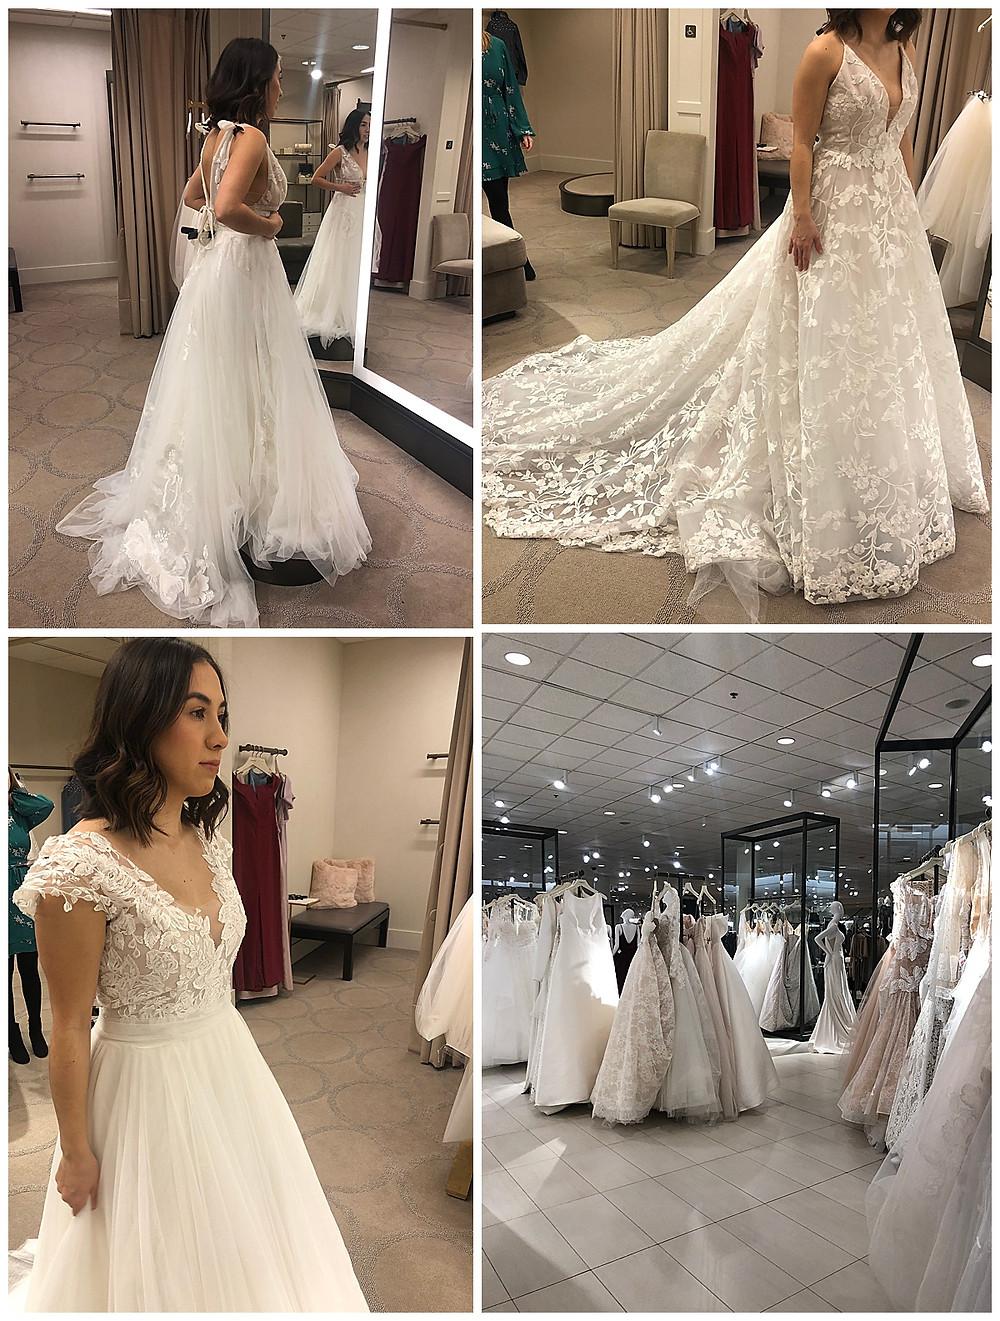 Wedding Dress | Modern Wedding Dress | Modern Bride | Wedding Details | Wedding Dress Inspiration | Texas Bride | Bride |  Wedding Inspiration | The Wedding Suite at Nordstrom | Wedding Gown